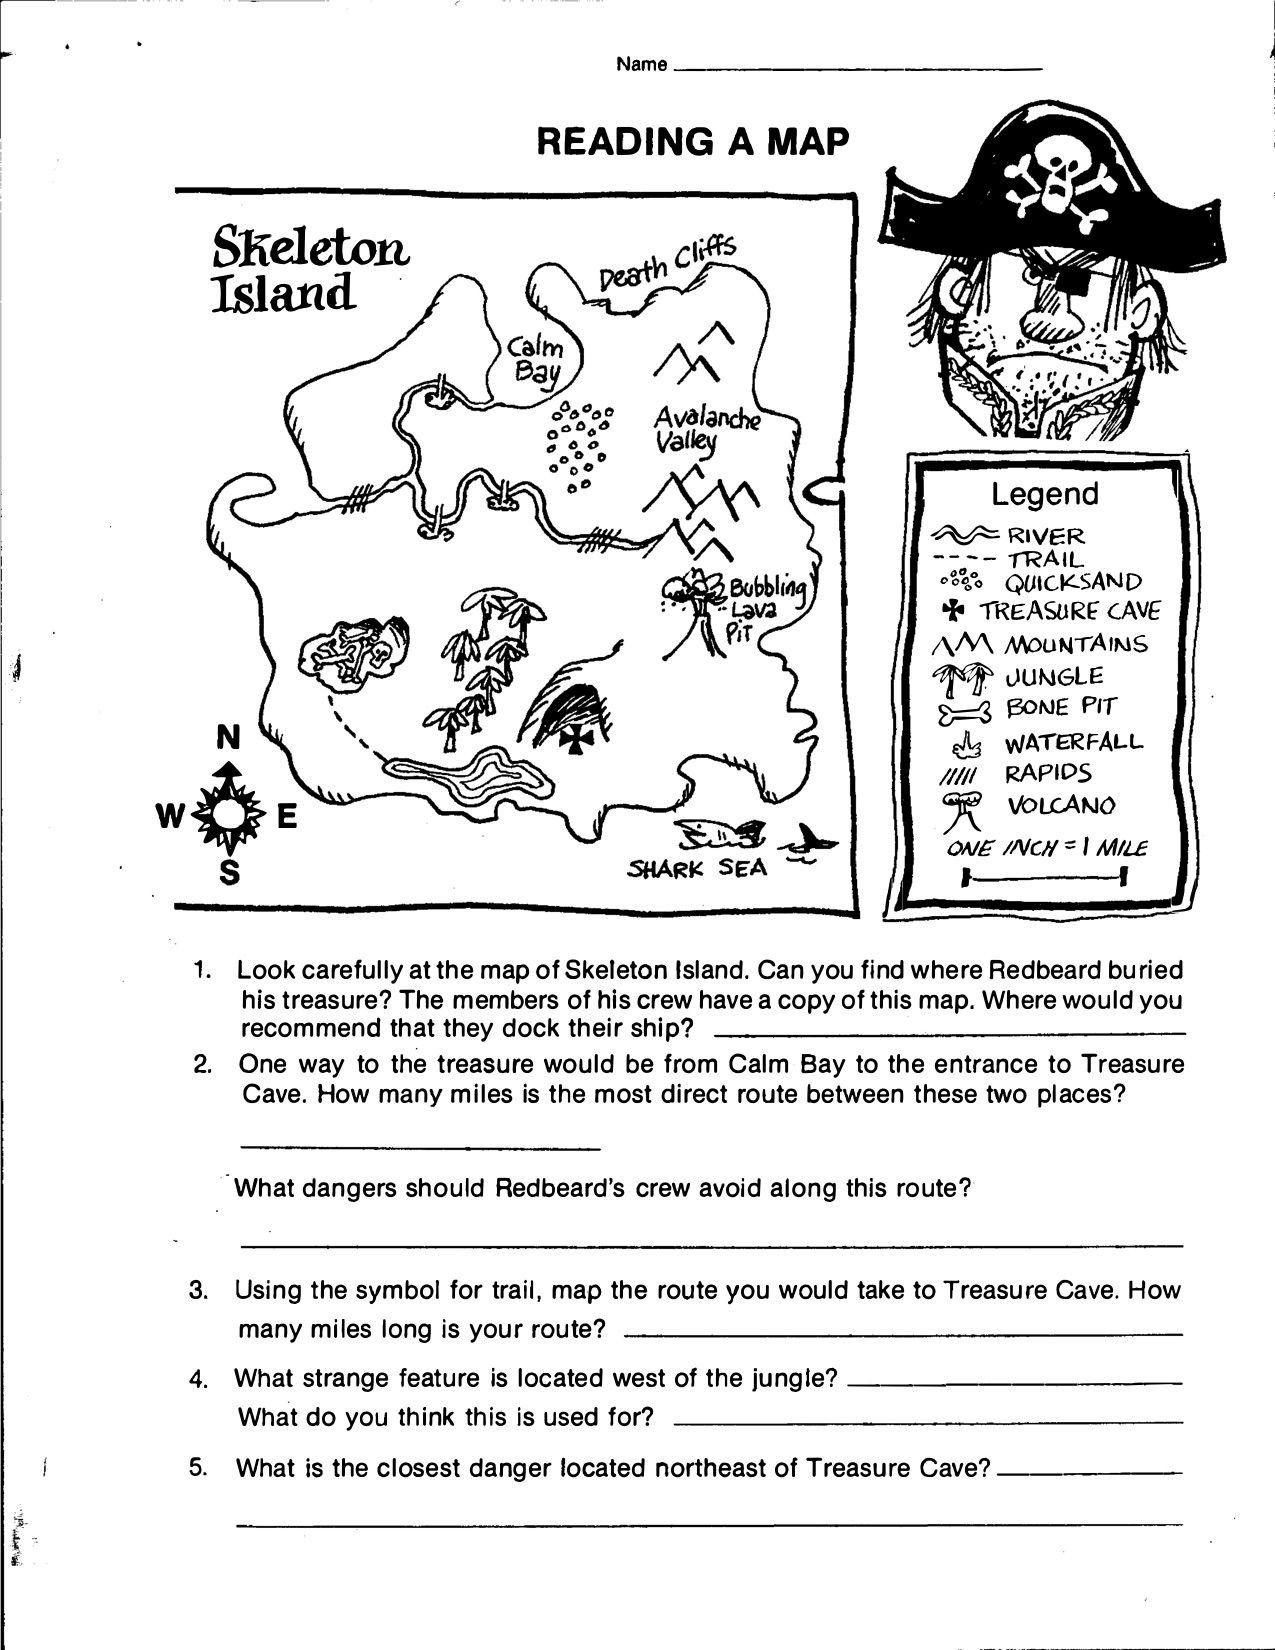 20 Reading A Map Worksheet Printable Worksheet Template Geography Worksheets Map Worksheets Word Problem Worksheets [ 1650 x 1275 Pixel ]